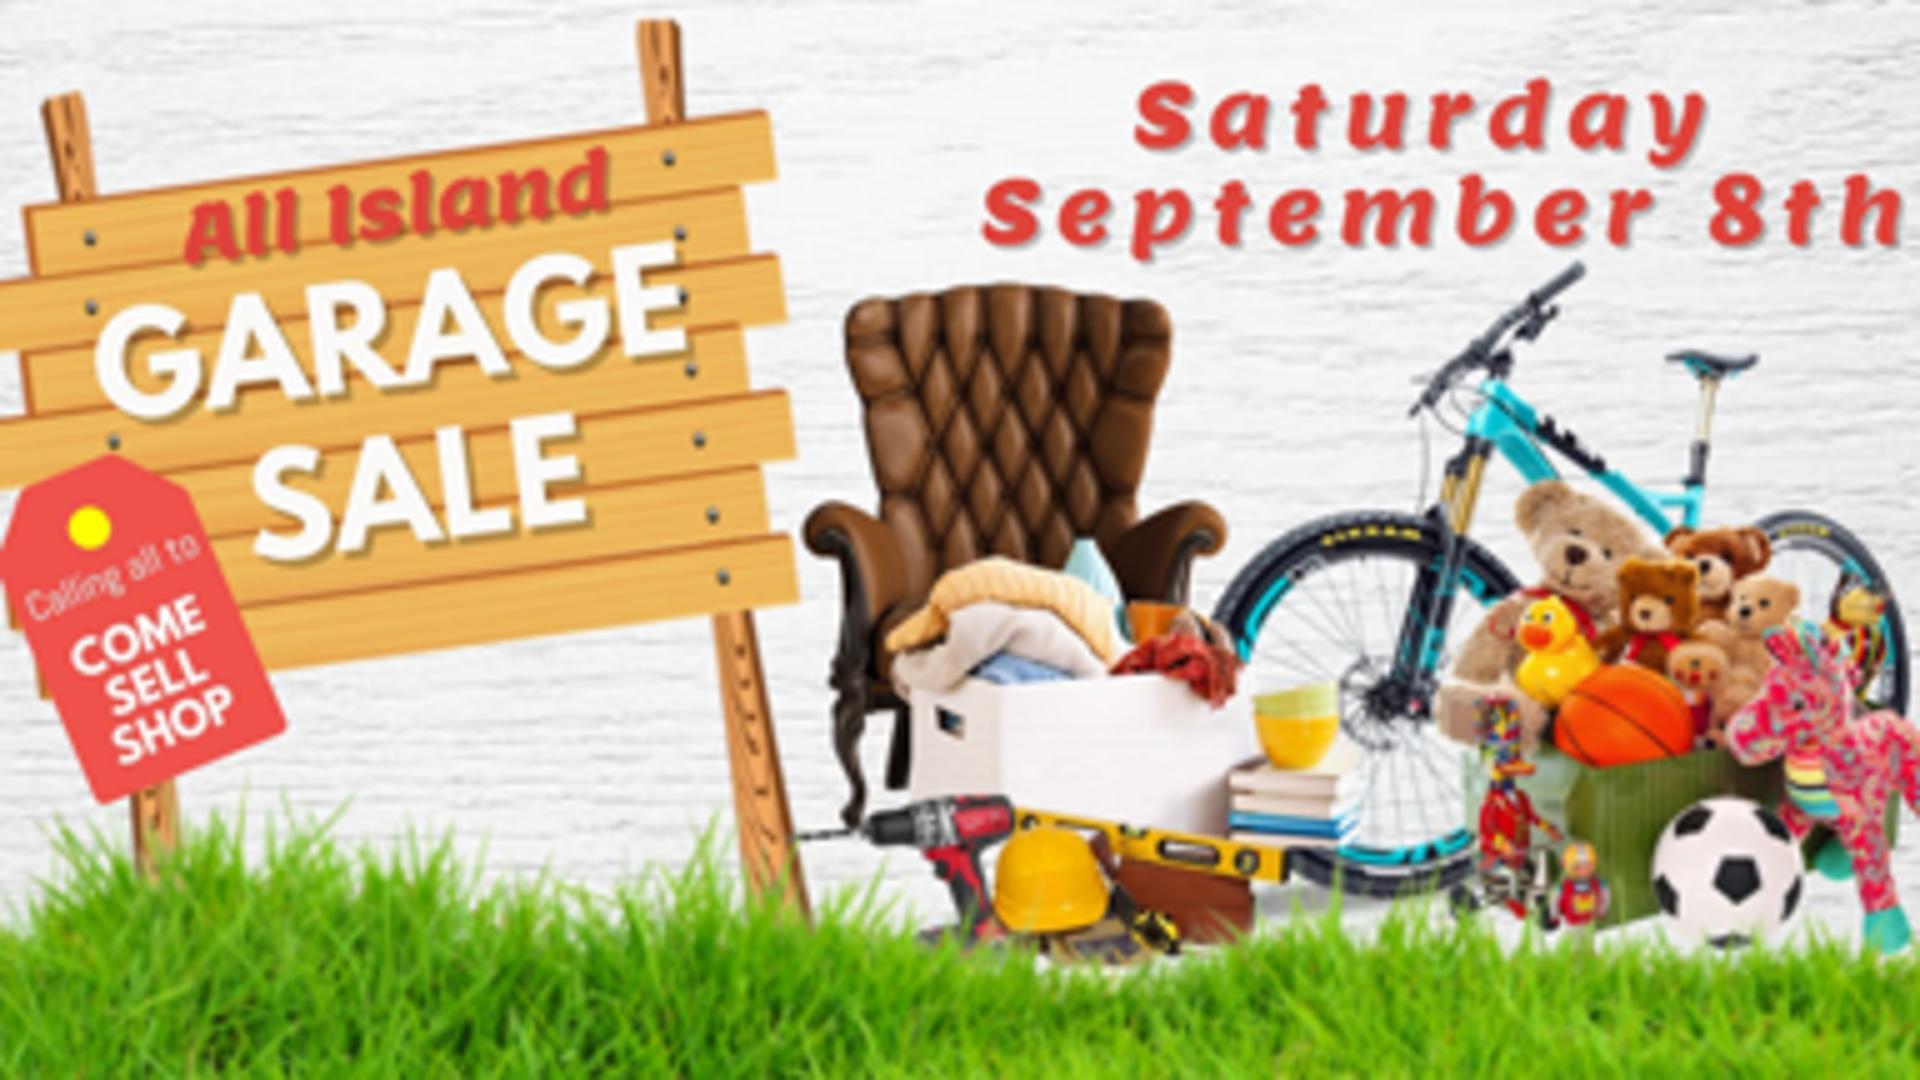 2018 Annual Fox Island Garage Sale – This Saturday, Sept. 8th!